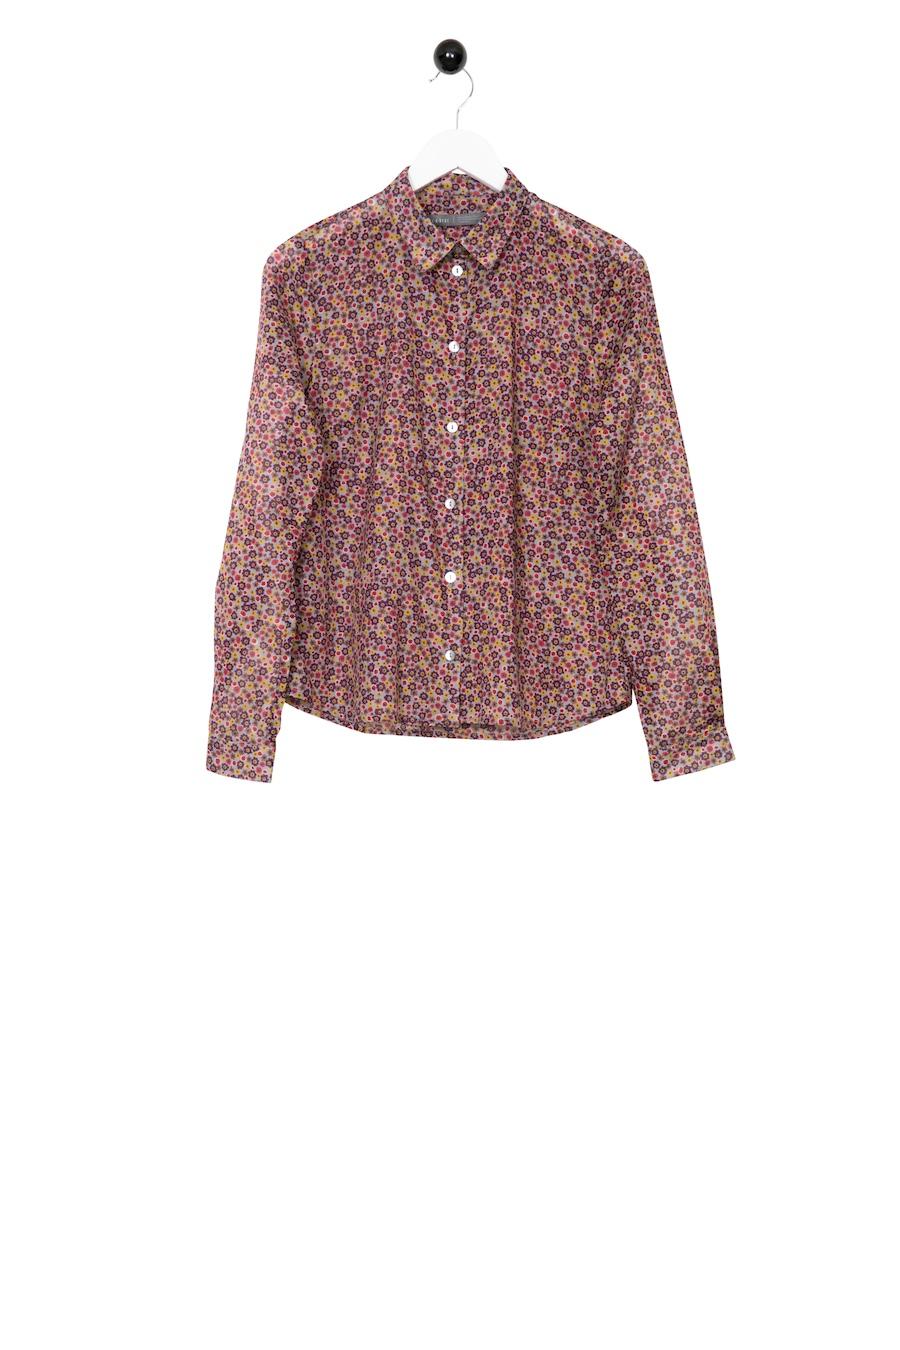 Porfyr Shirt